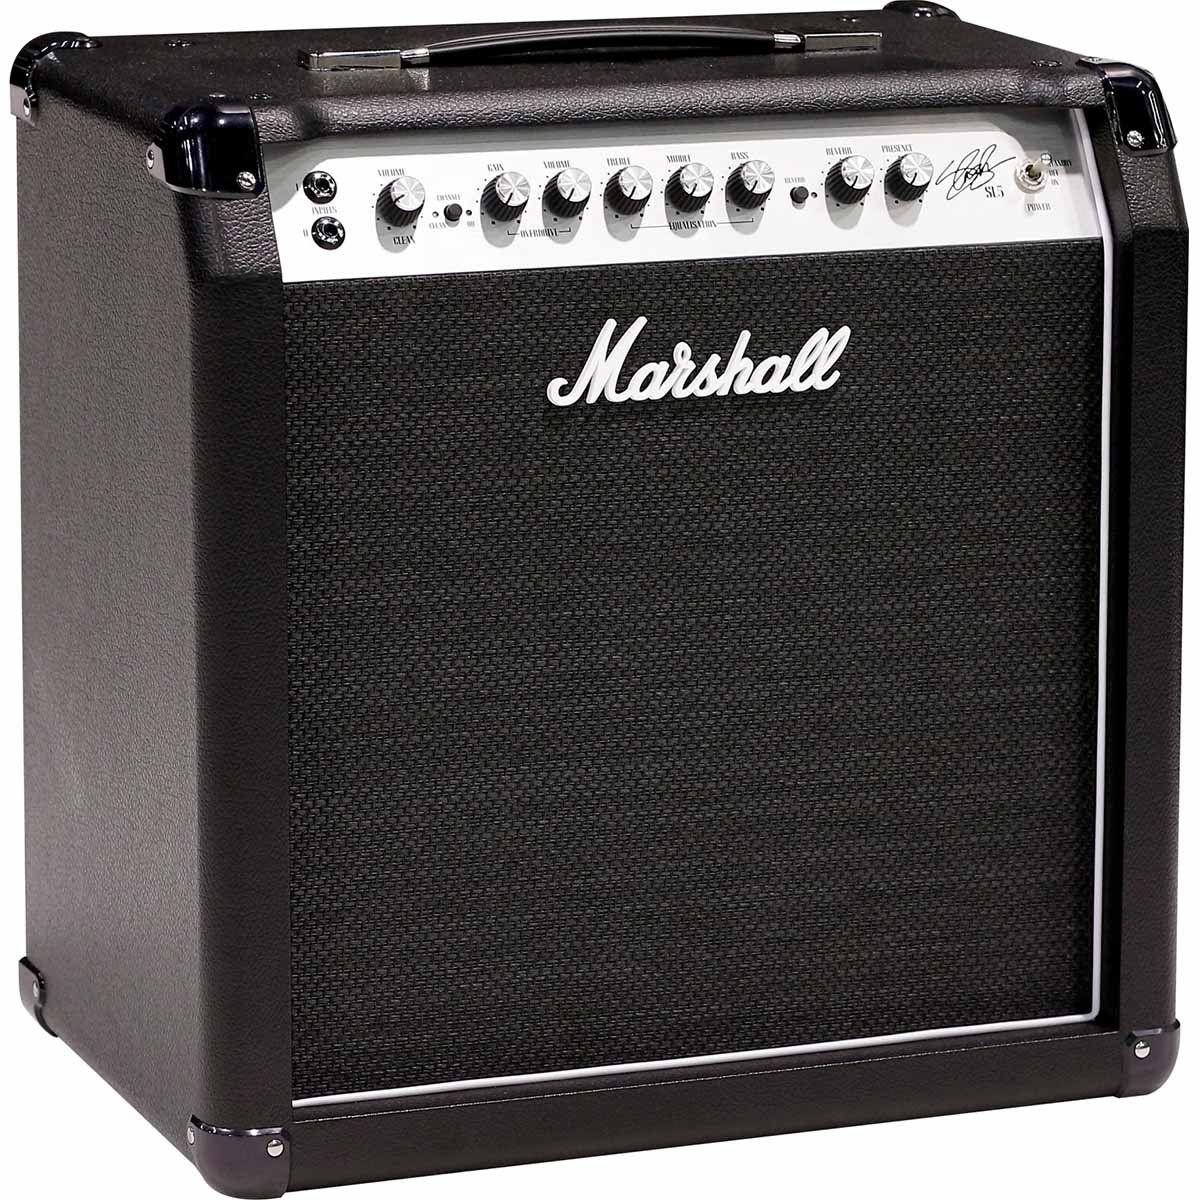 Marshall SL5 Amplificador Combo para Guitarra 5w Assinada pelo Slash